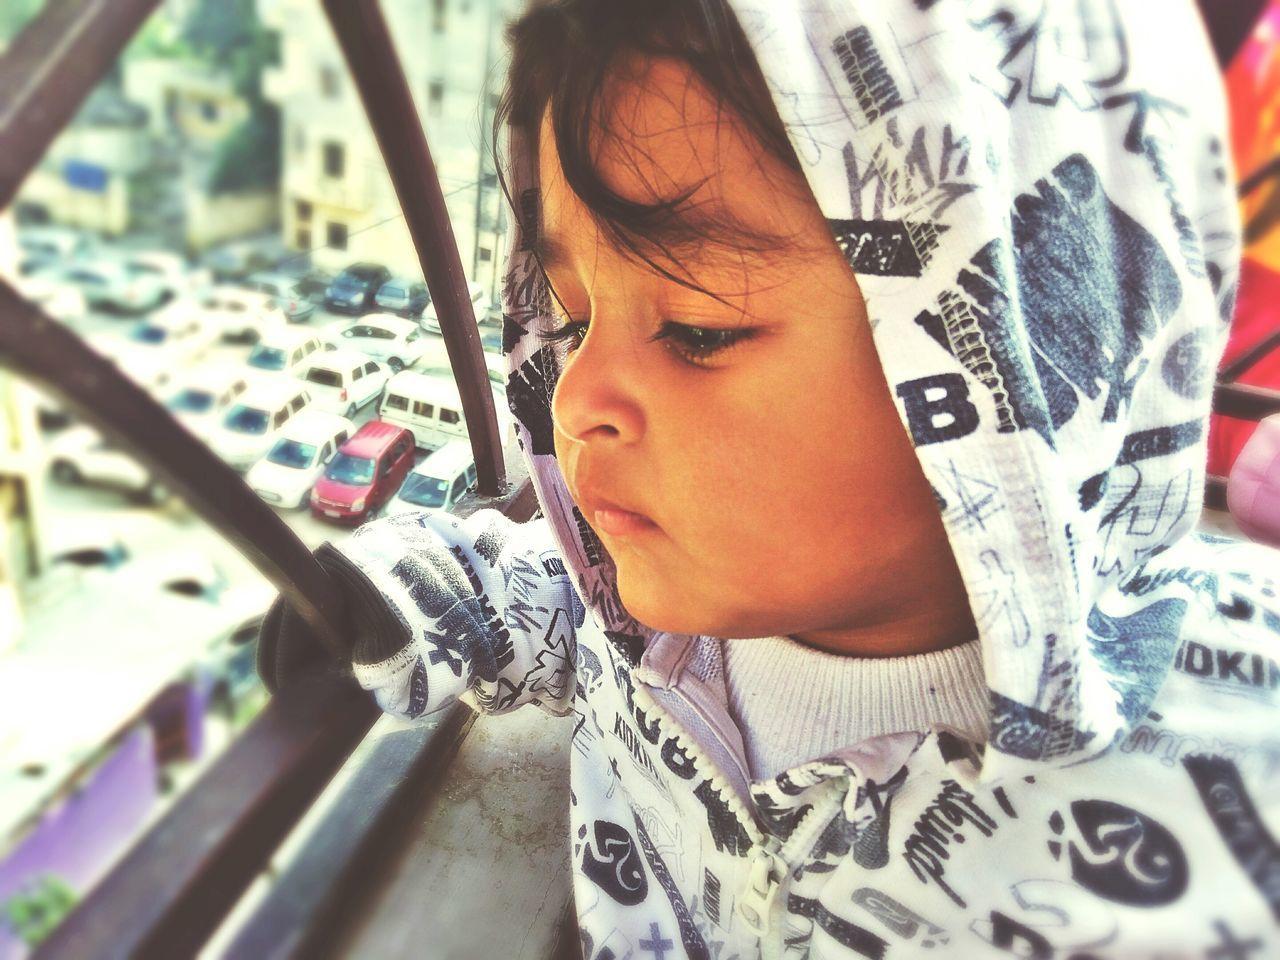 Headshot Close-up People Human Body Part Kid Portrait Portrait Cuteness Of Kid Enthusiasm 🇮🇳 India Innocence Deep Eyes Of Kid Looking At World